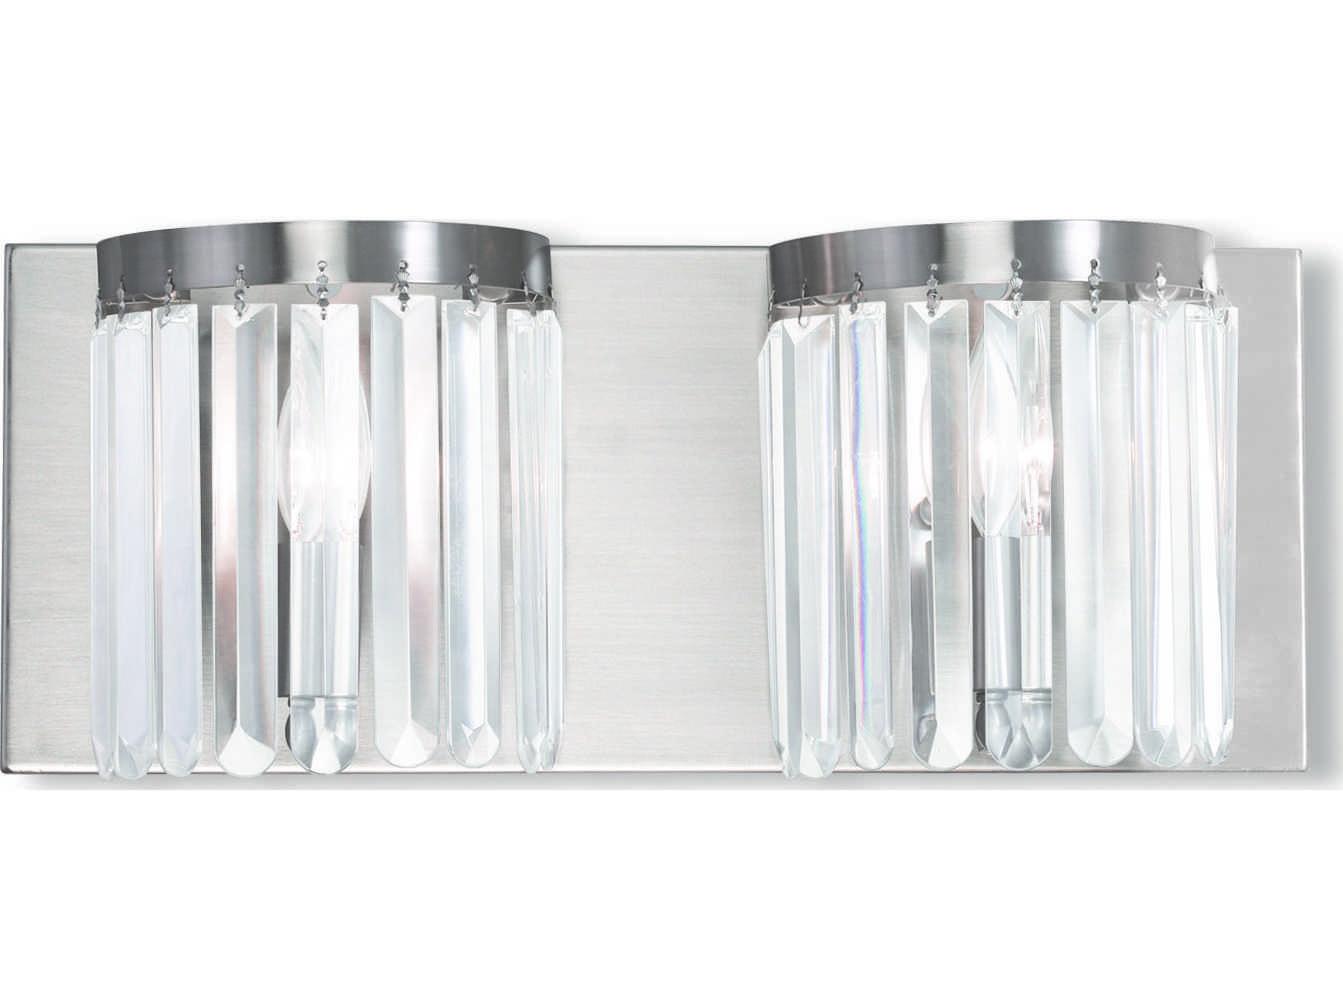 Livex 2 Light Bathroom Vanity Lighting Fixture Brushed: Livex Lighting Ashton Brushed Nickel Two-Light Bath Light